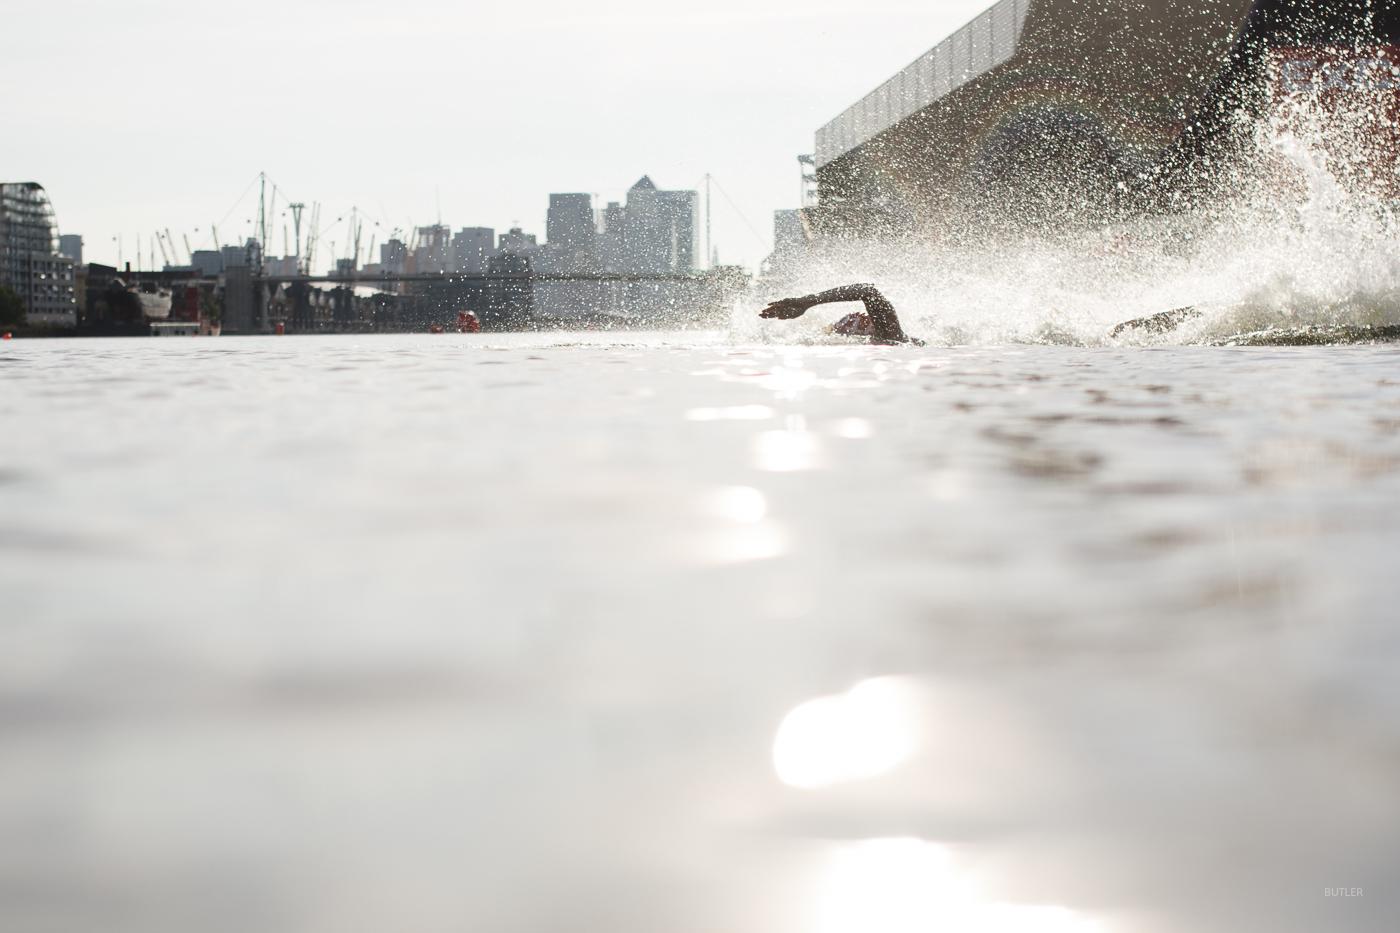 toby-butler-ocean-adventure-devon-unitedkingdom-surf-lifestyle-outdoor-photographer-photography-utah-fashion-england-5.jpg